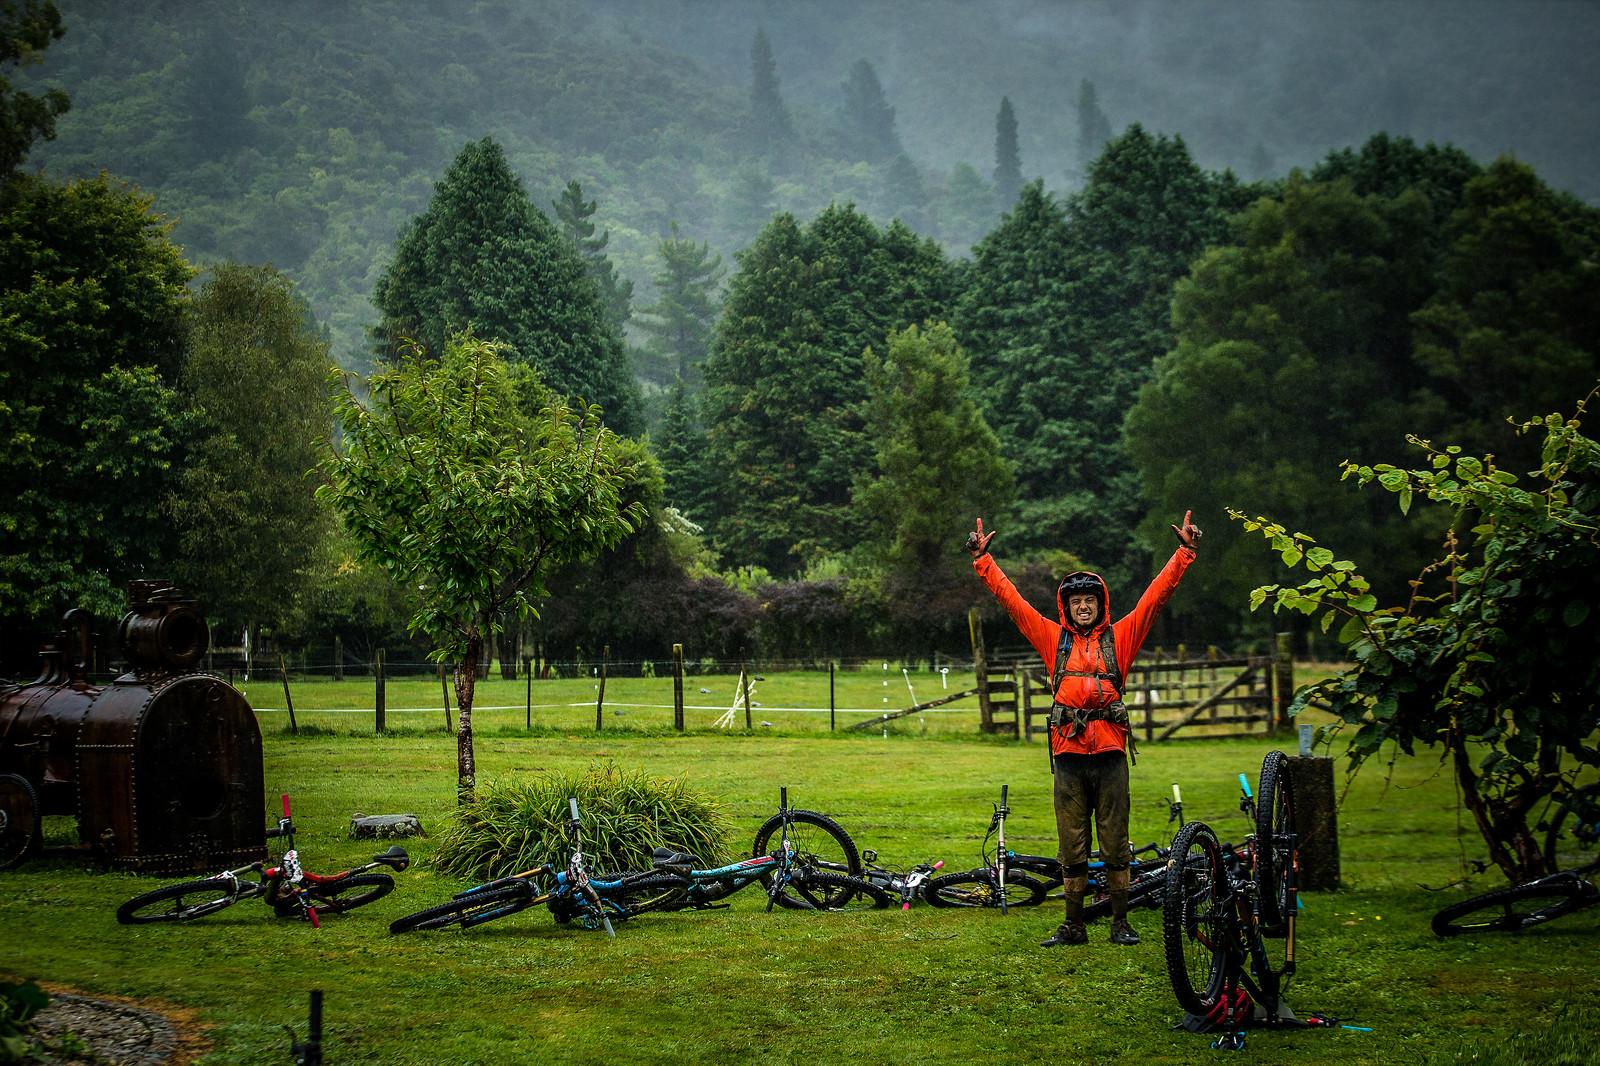 Sam Needham and Gary Perkin - NZ Enduro Day 2 - Mountain Biking Pictures - Vital MTB